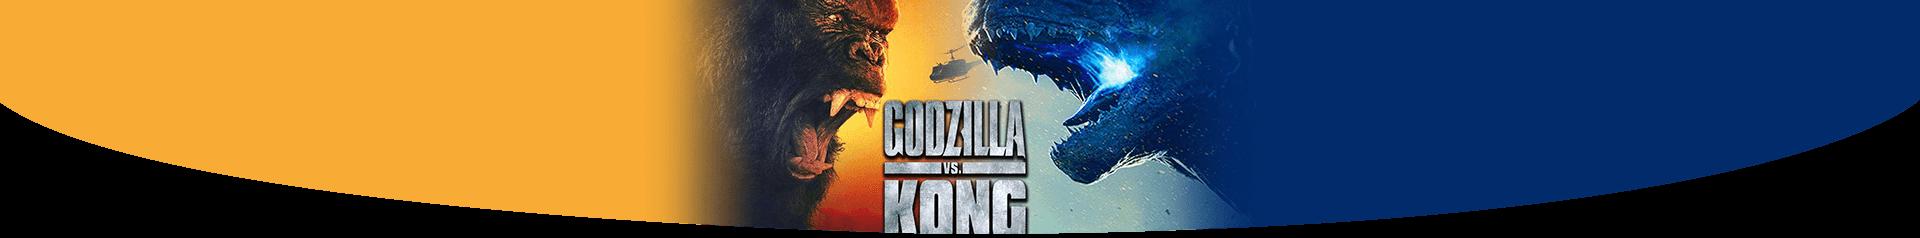 godzilla-kingkong1